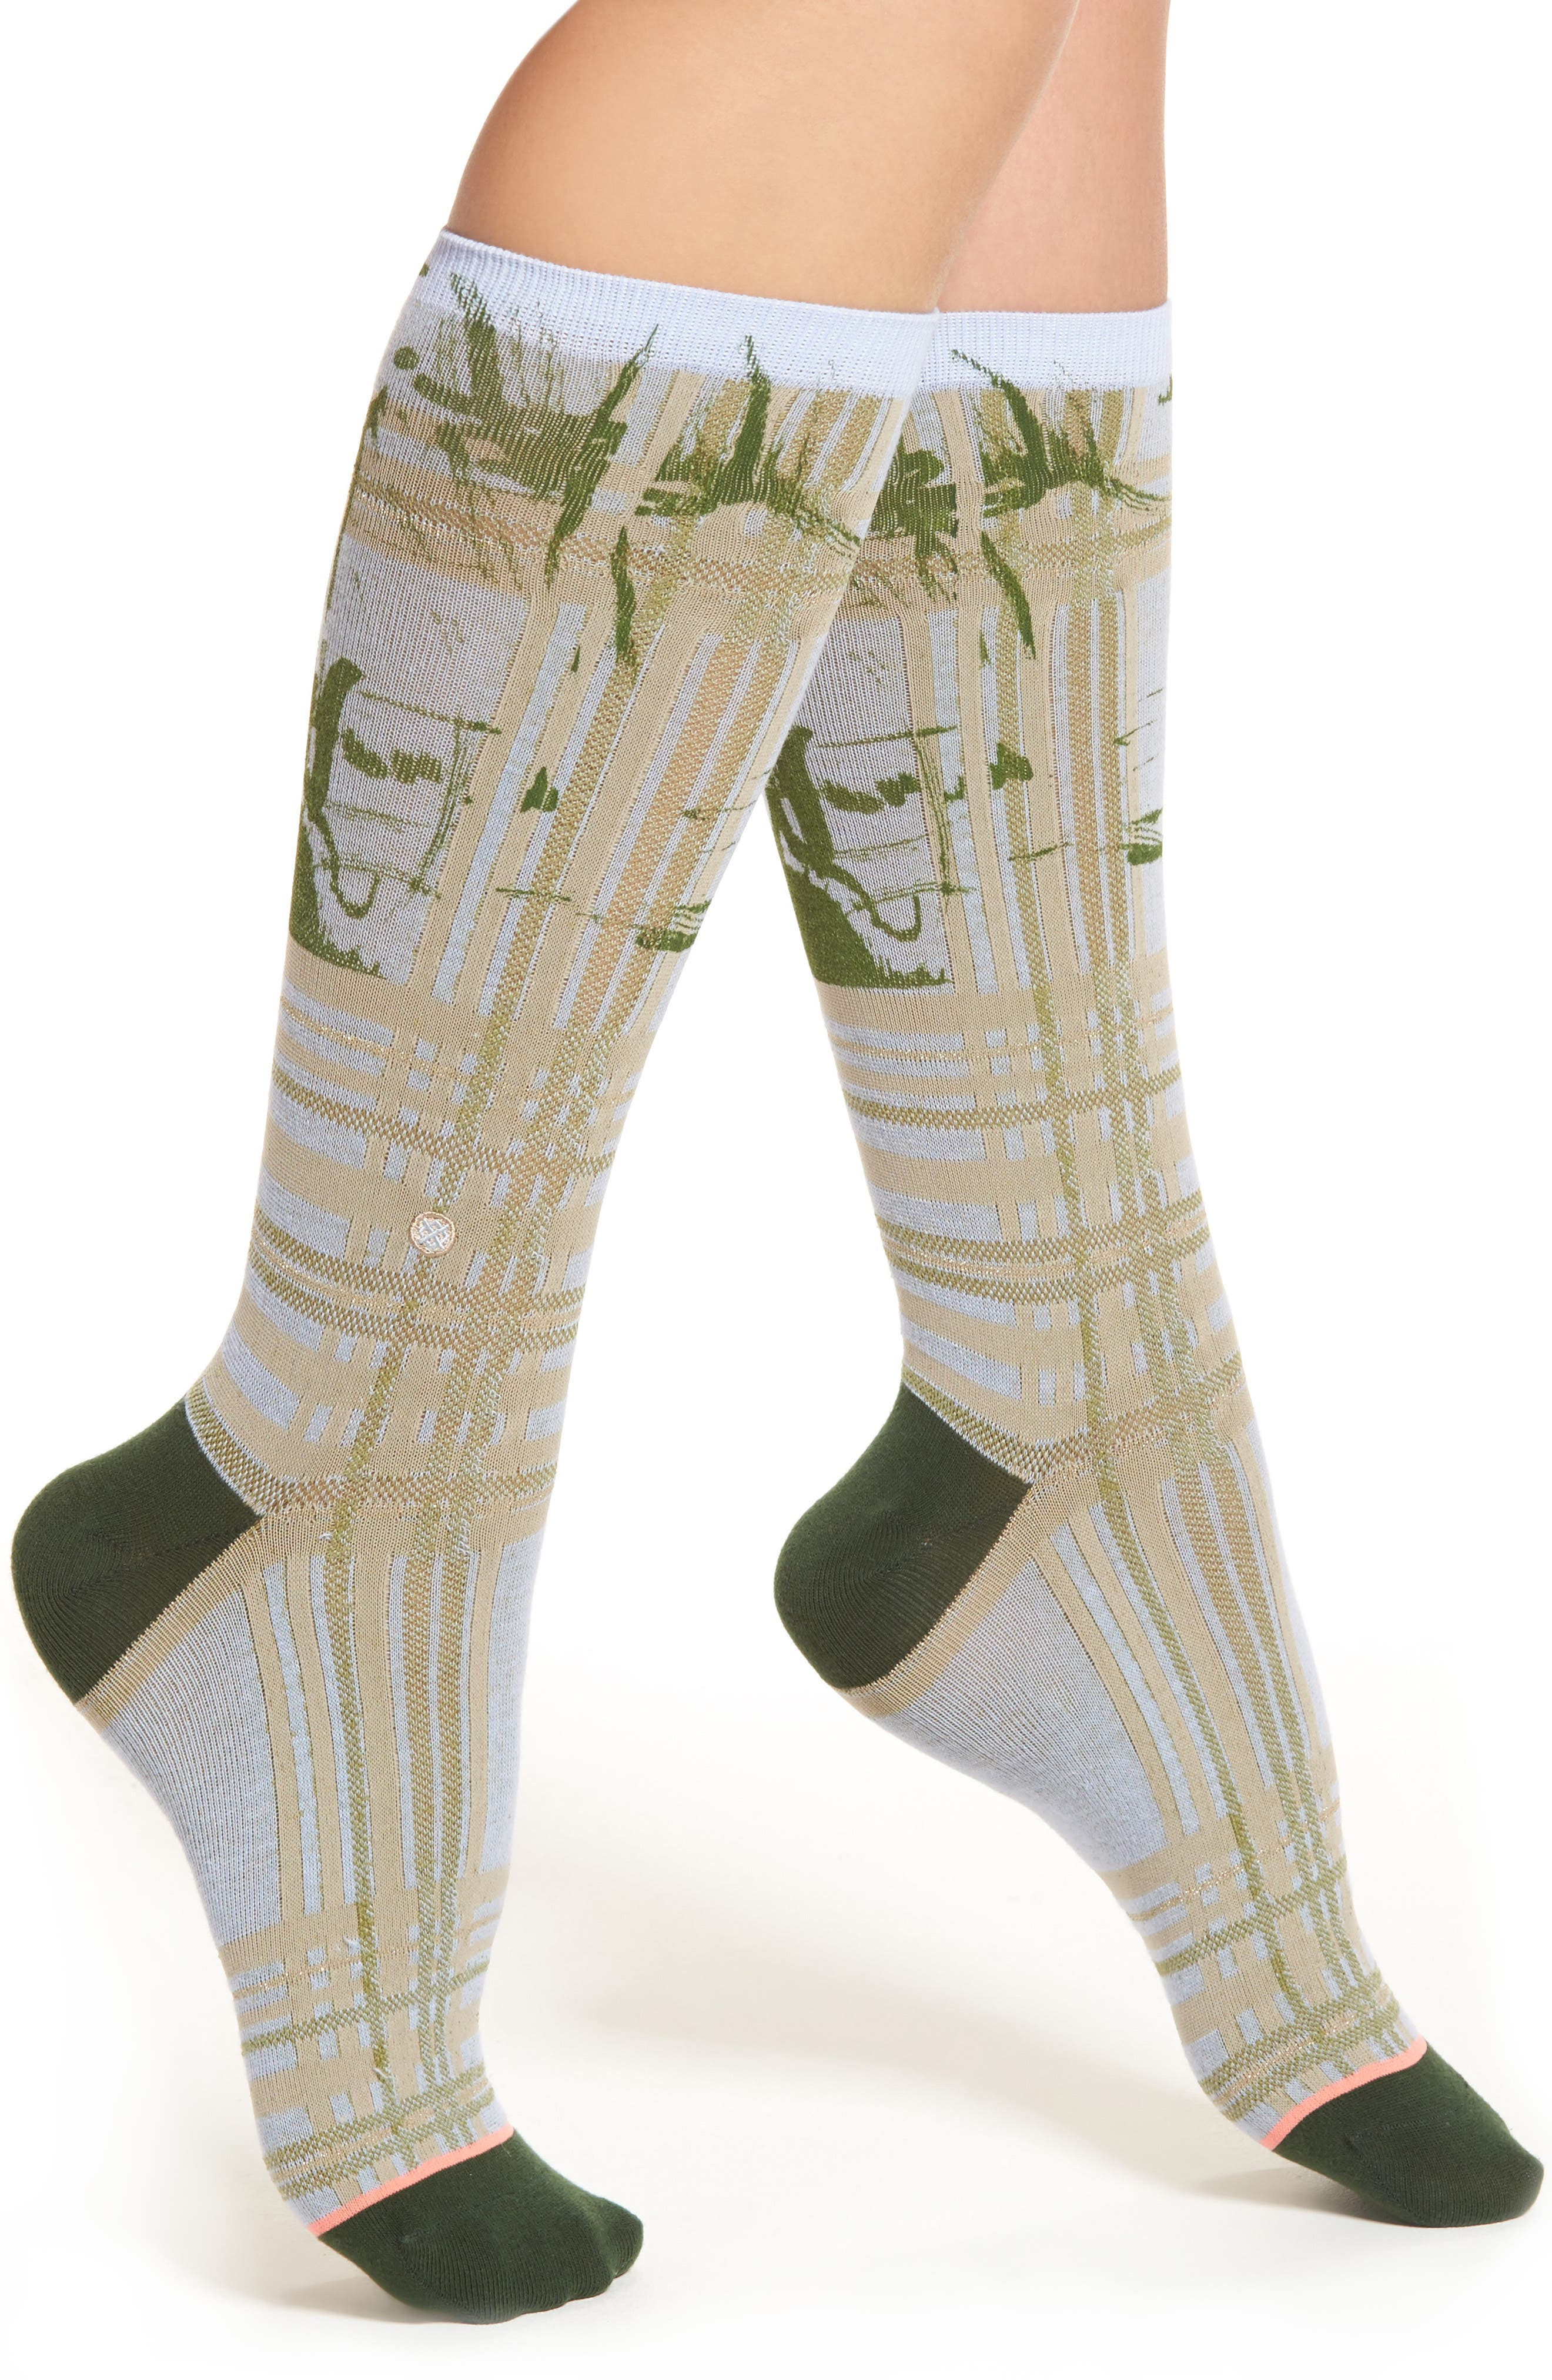 Cobble Hill Socks,                         Main,                         color, 500